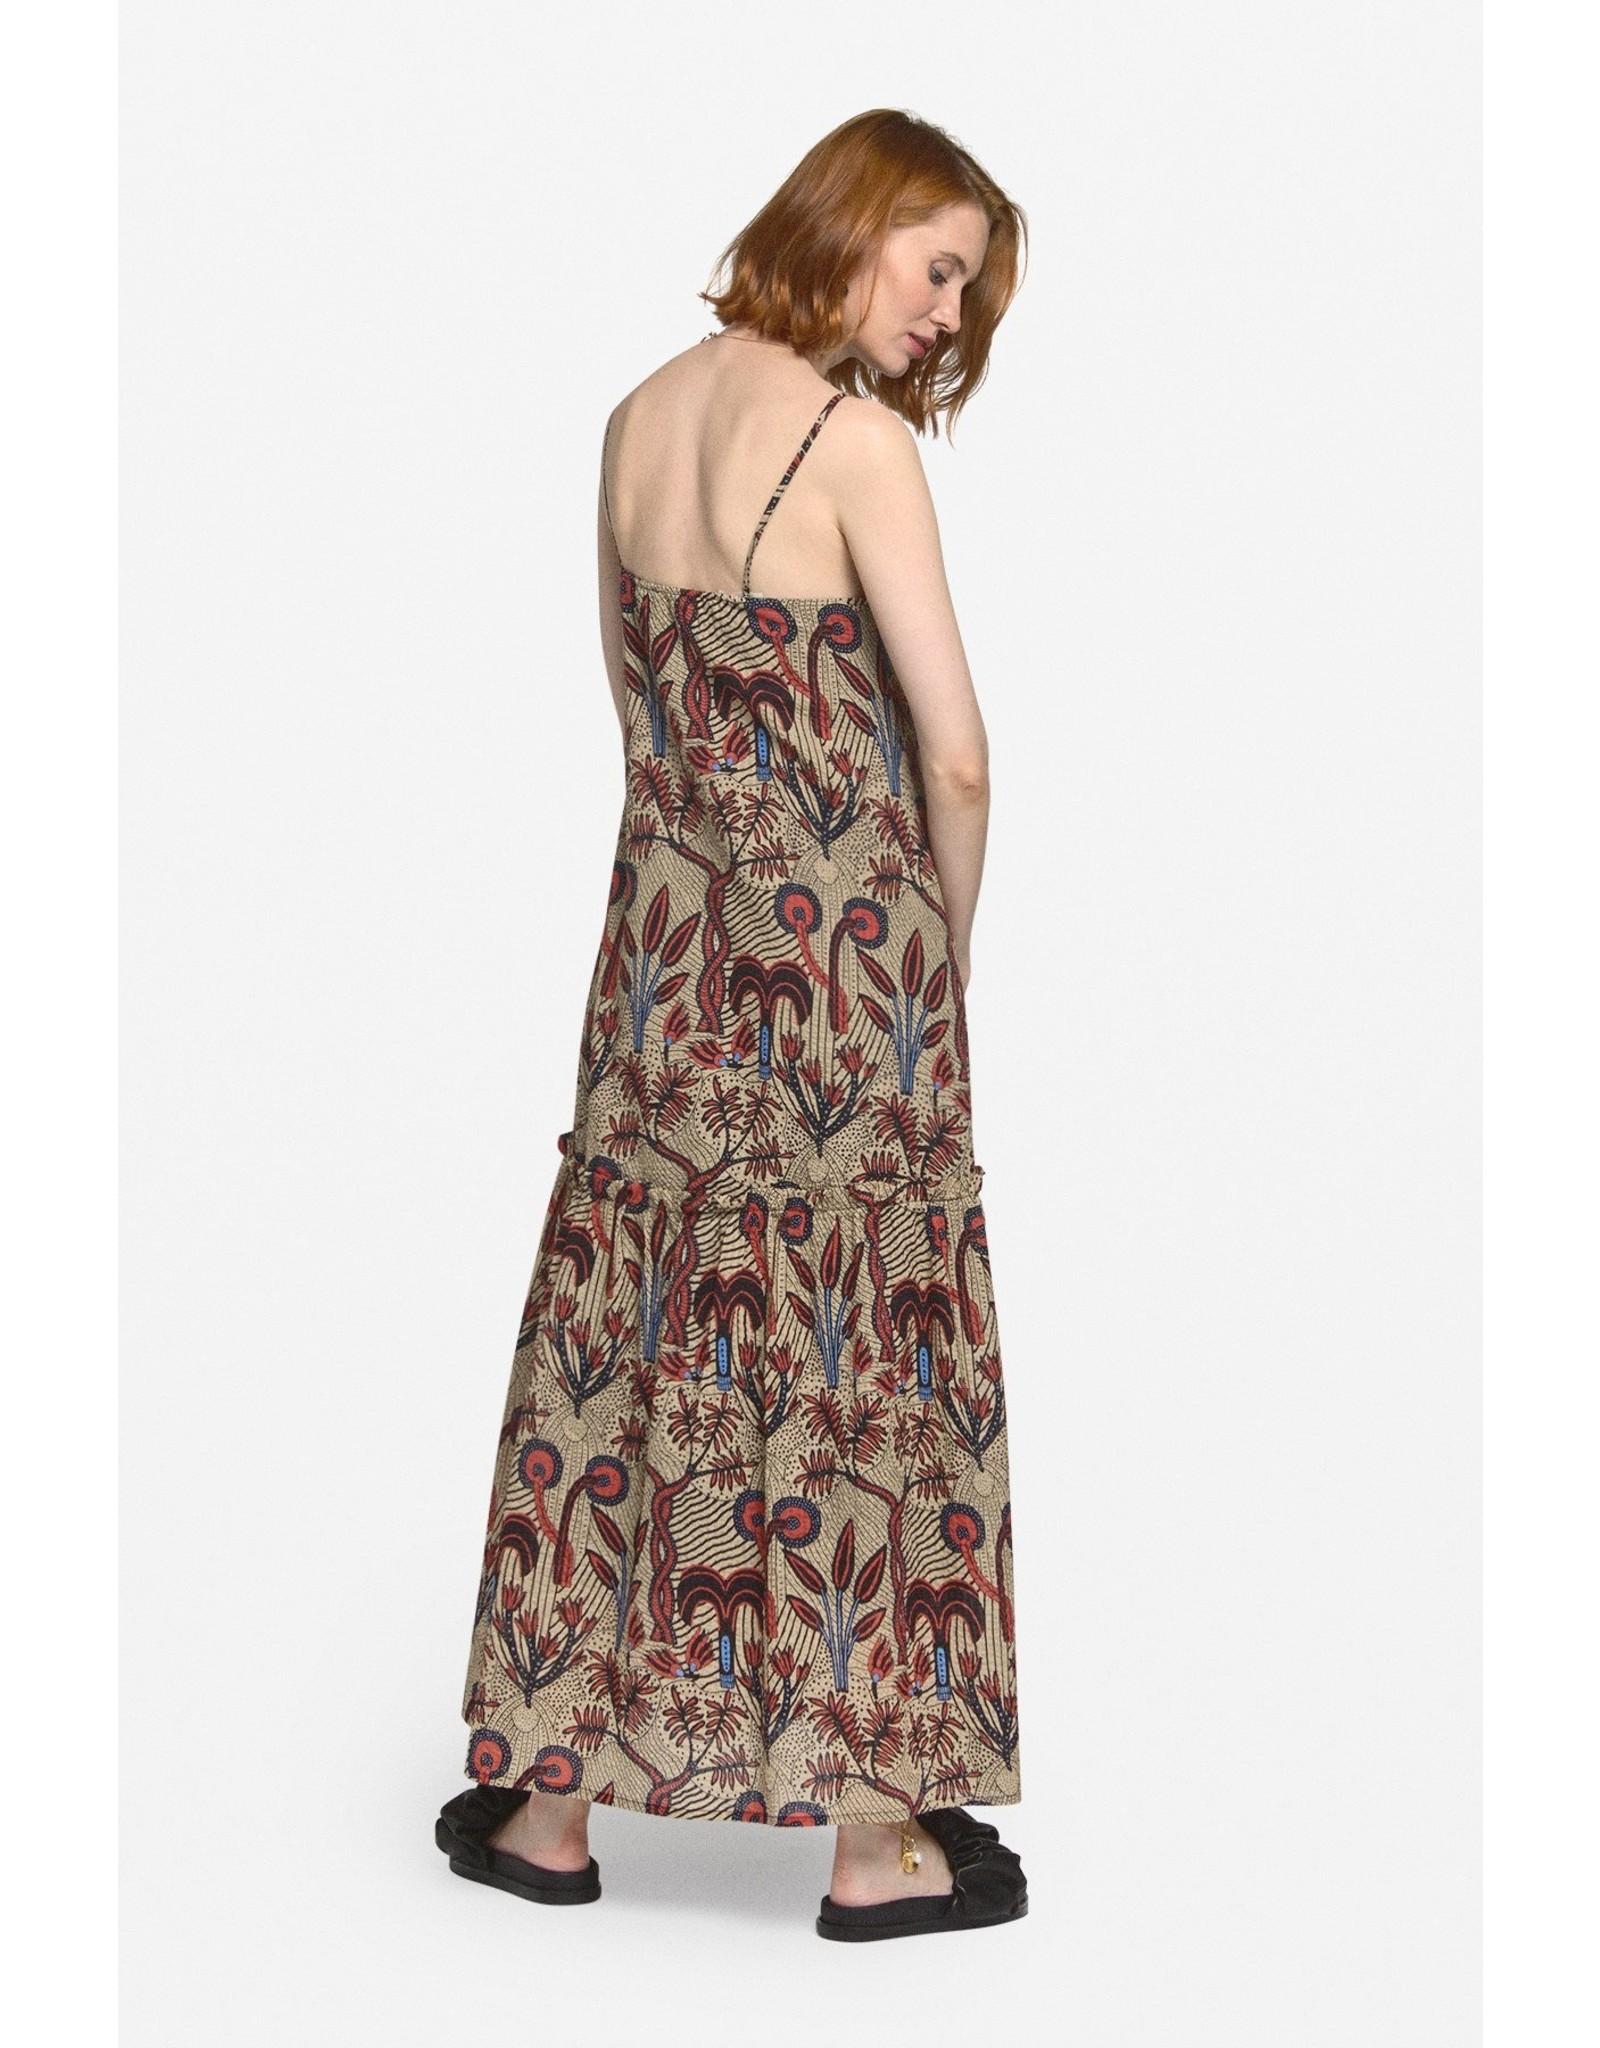 Ottod'Ame Printed Cotton Oversized Dress - DA4315